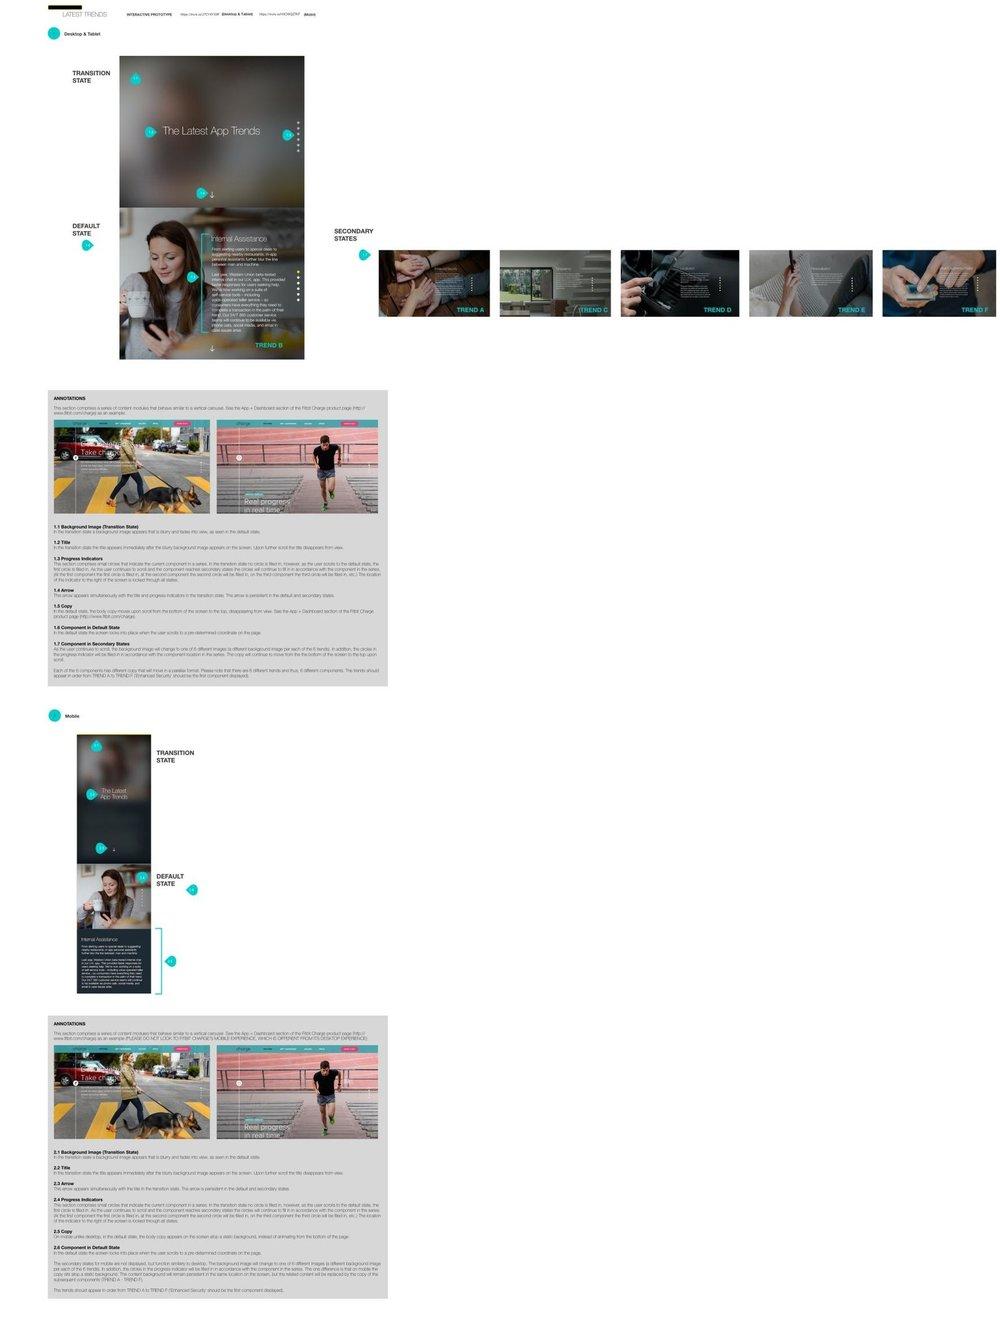 WU_5X_Annotations-6.jpg